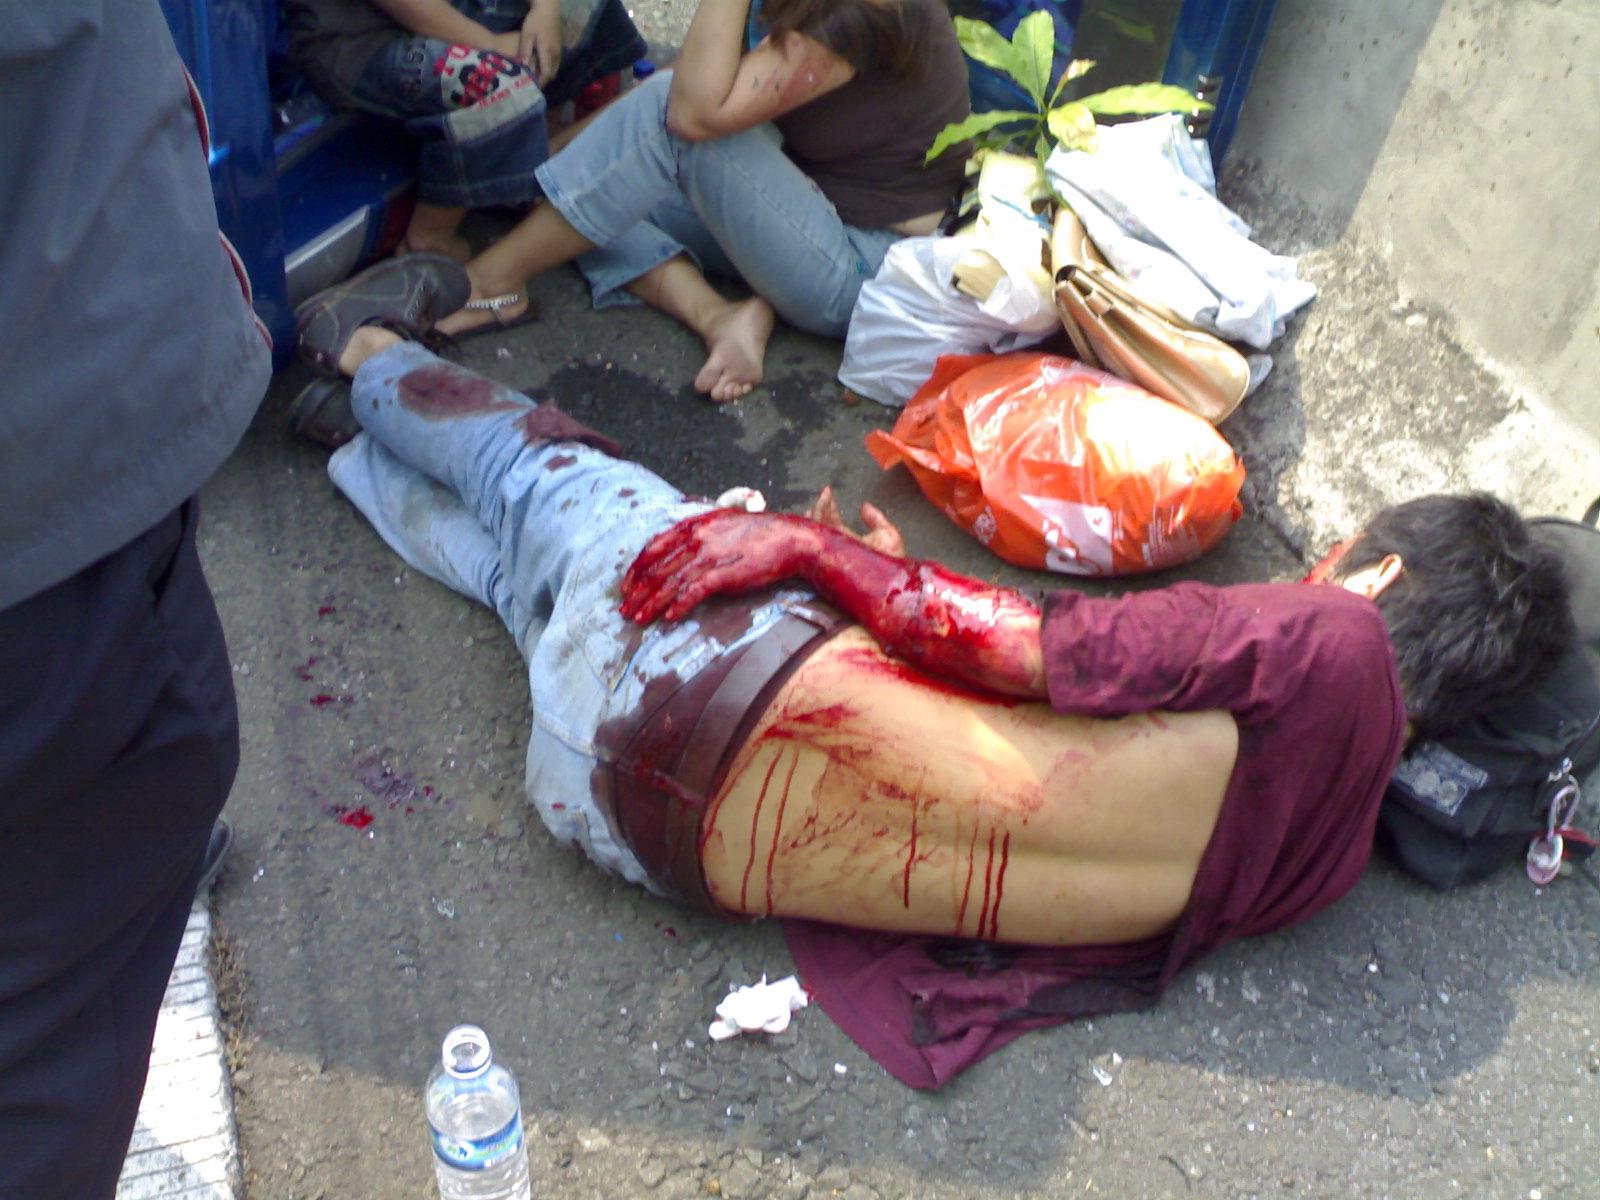 ... kecelakaan lalu lintas) - Foto diambil dari: http://tissuebasah.files